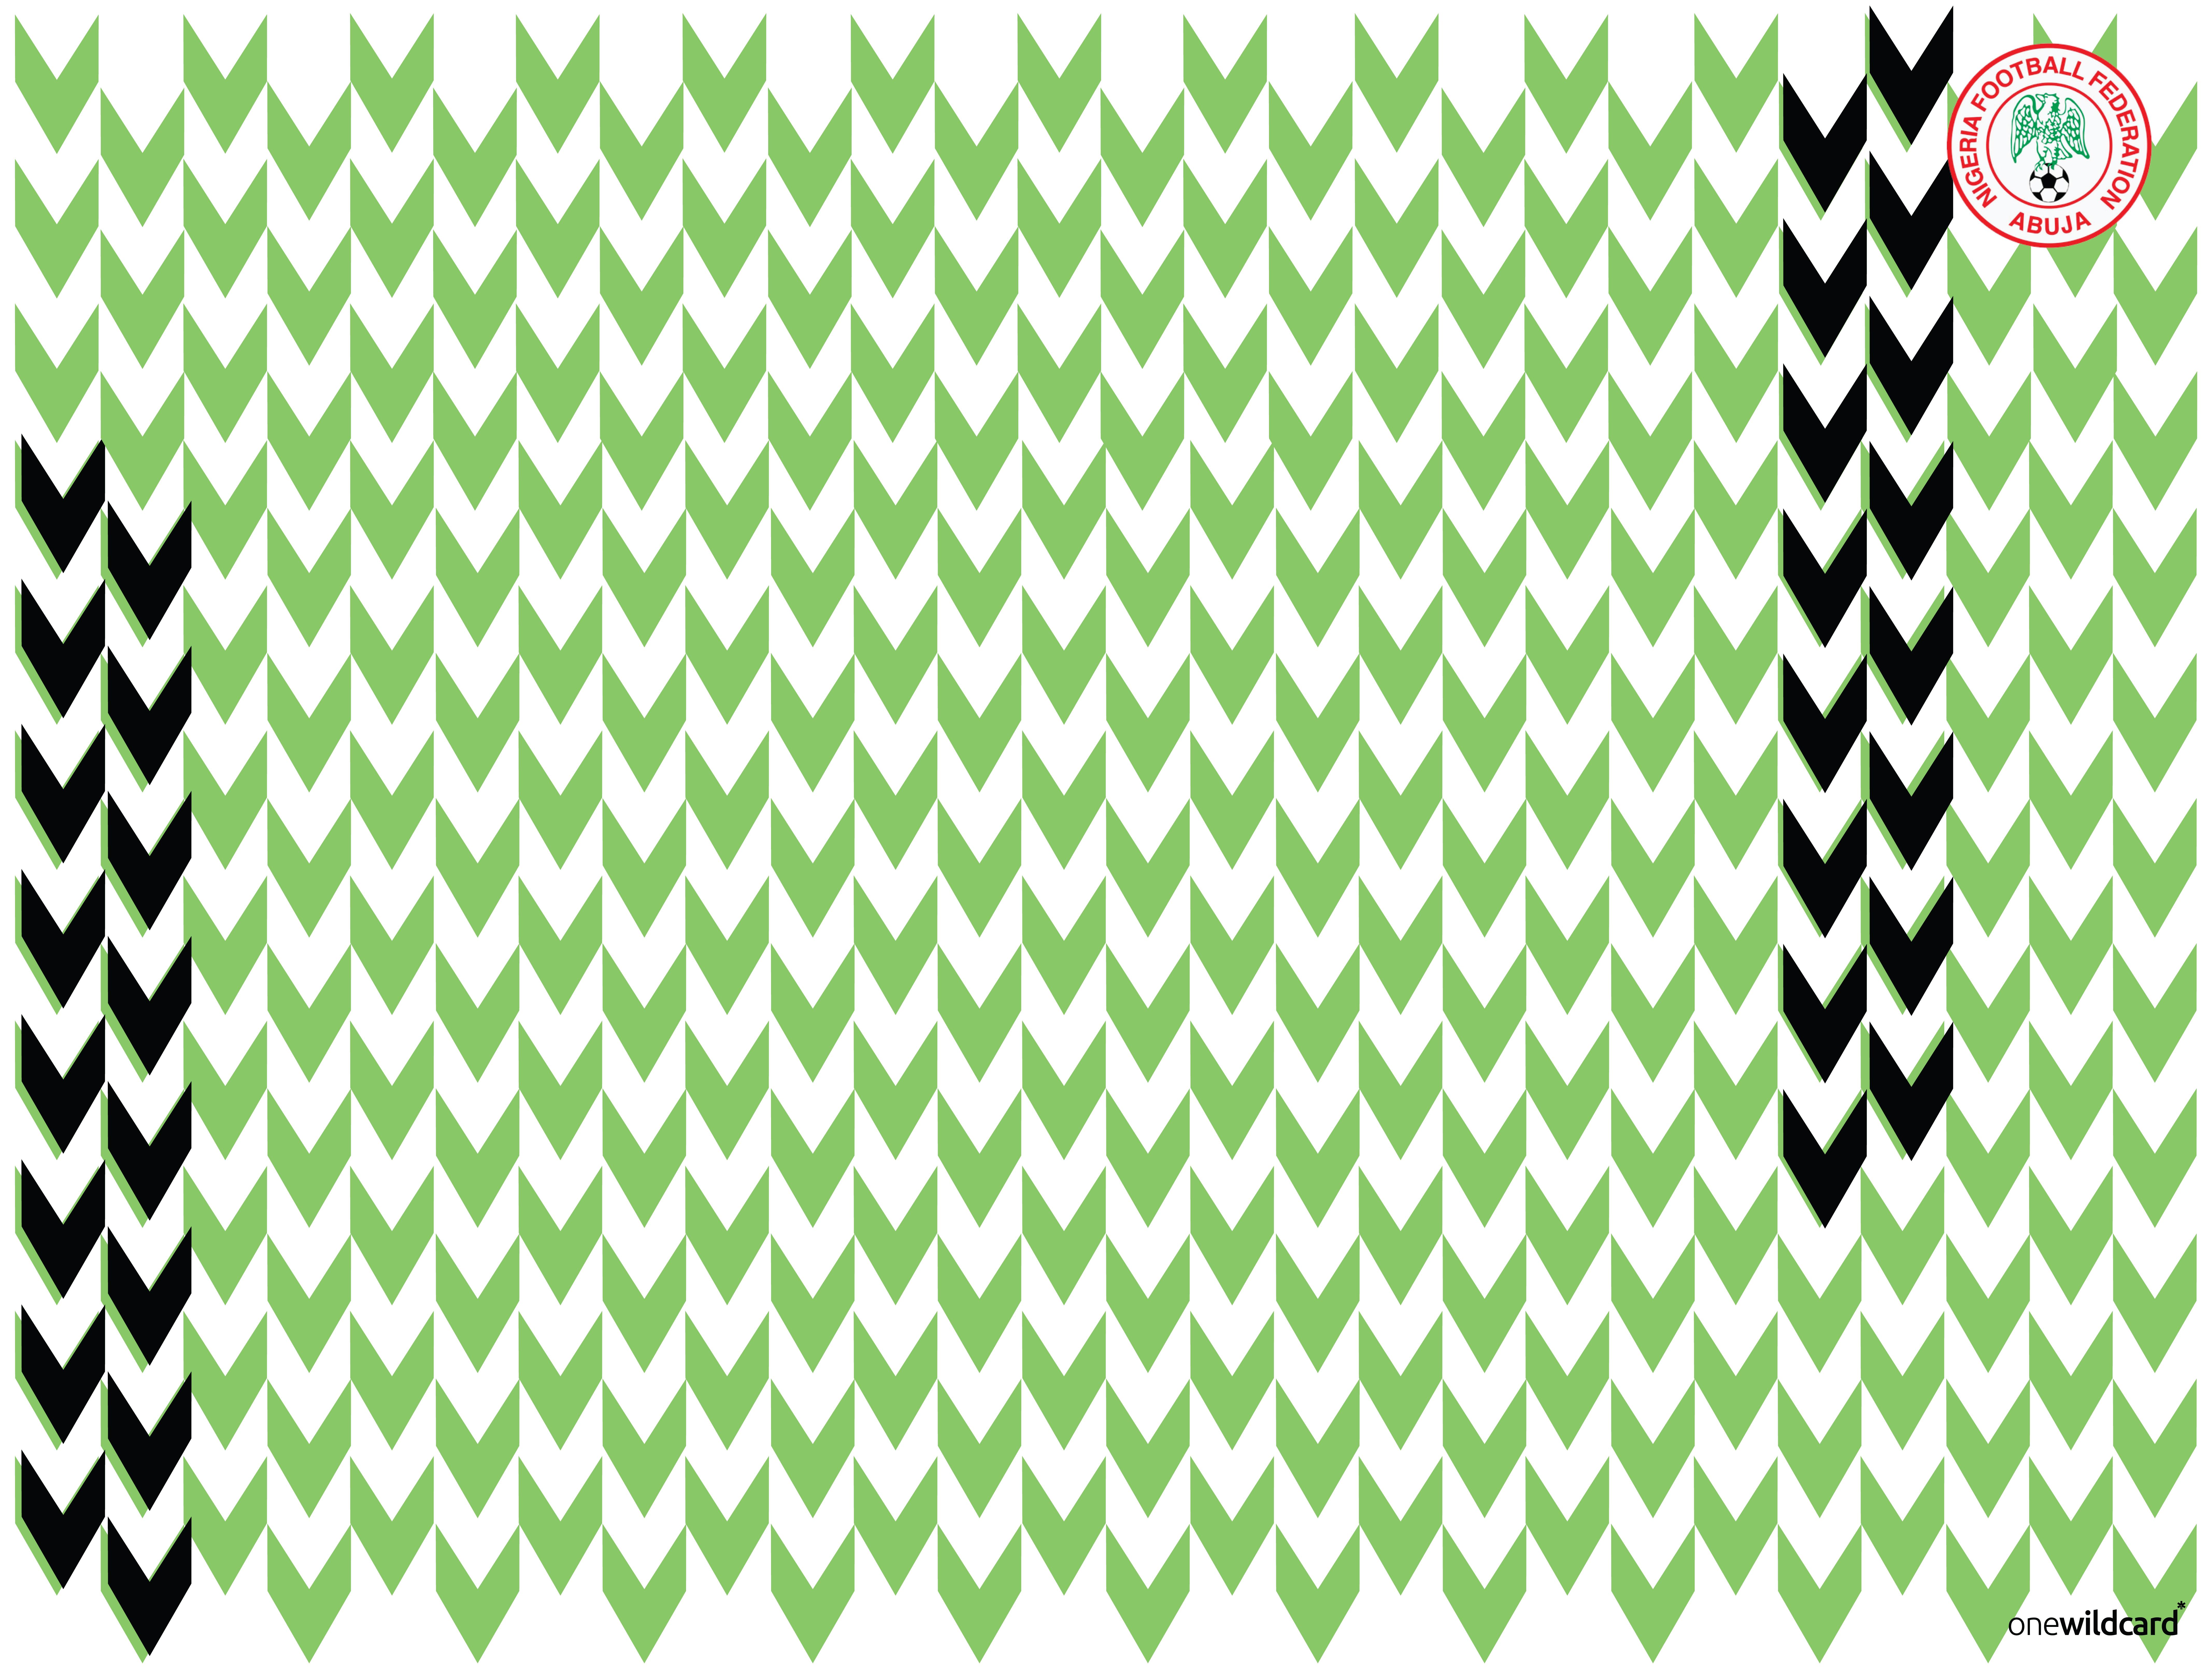 Nigeria Jersey Desktop Wallpaper Onewildcard